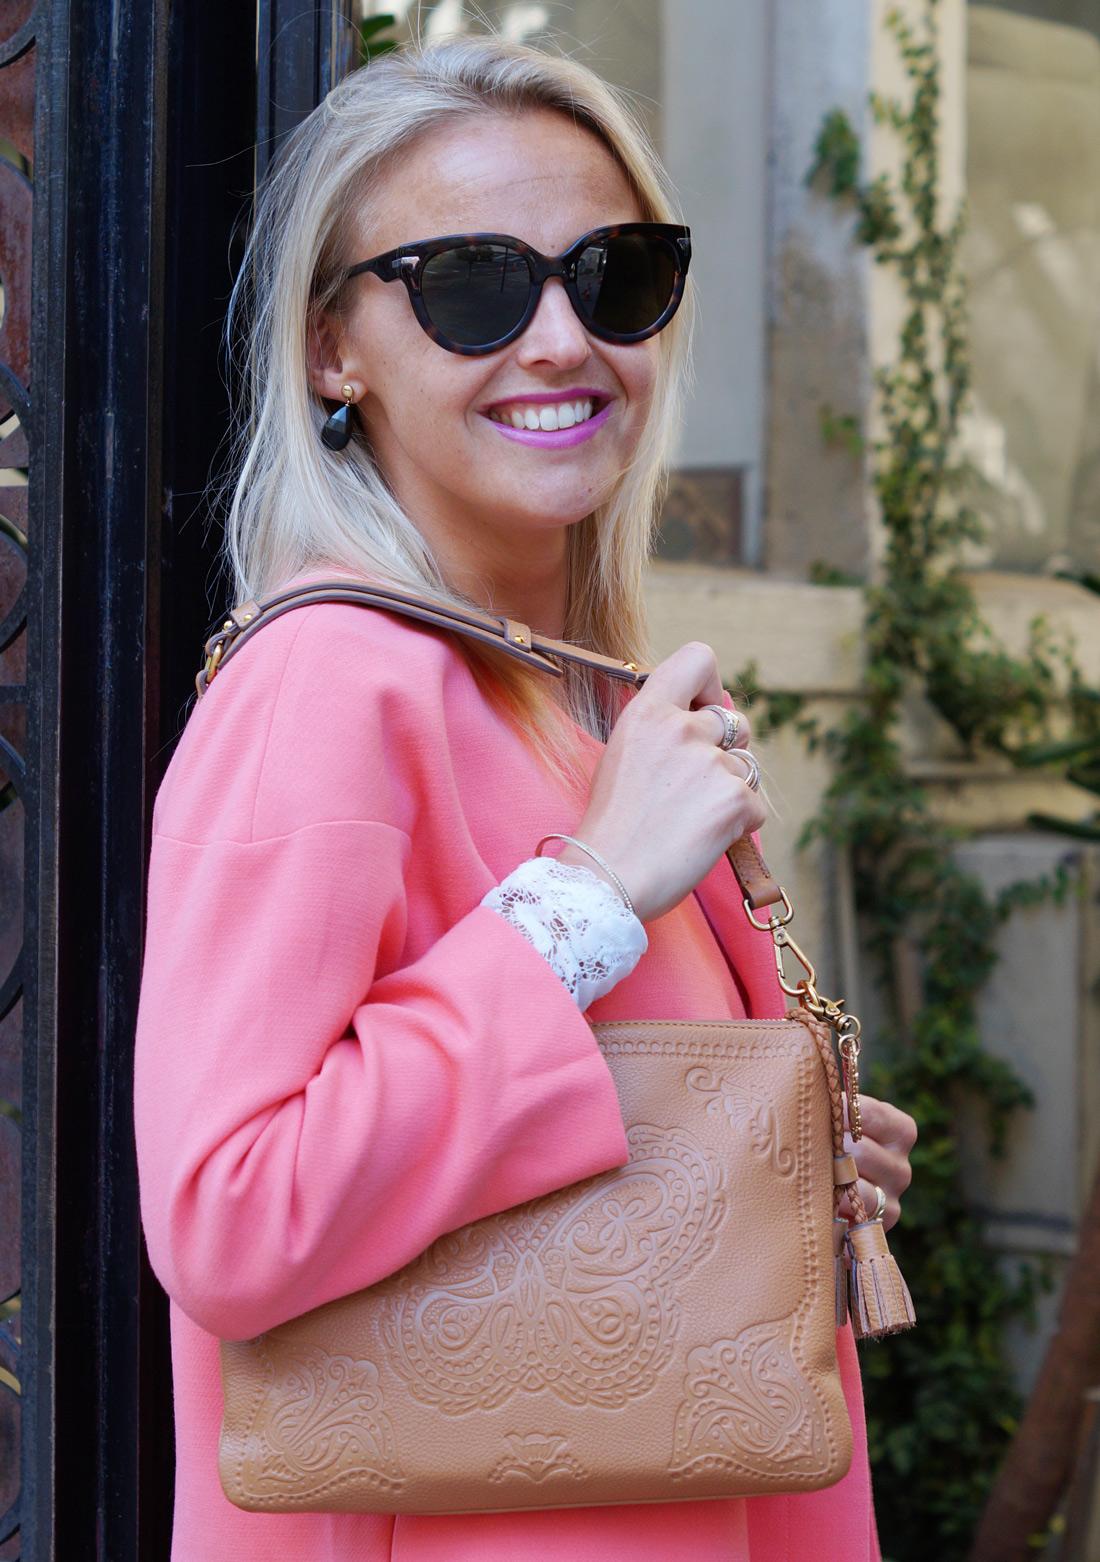 Bag-at-you---Fashion-blog---San-Francisco---Pink-WE-coat---Leather-Bag